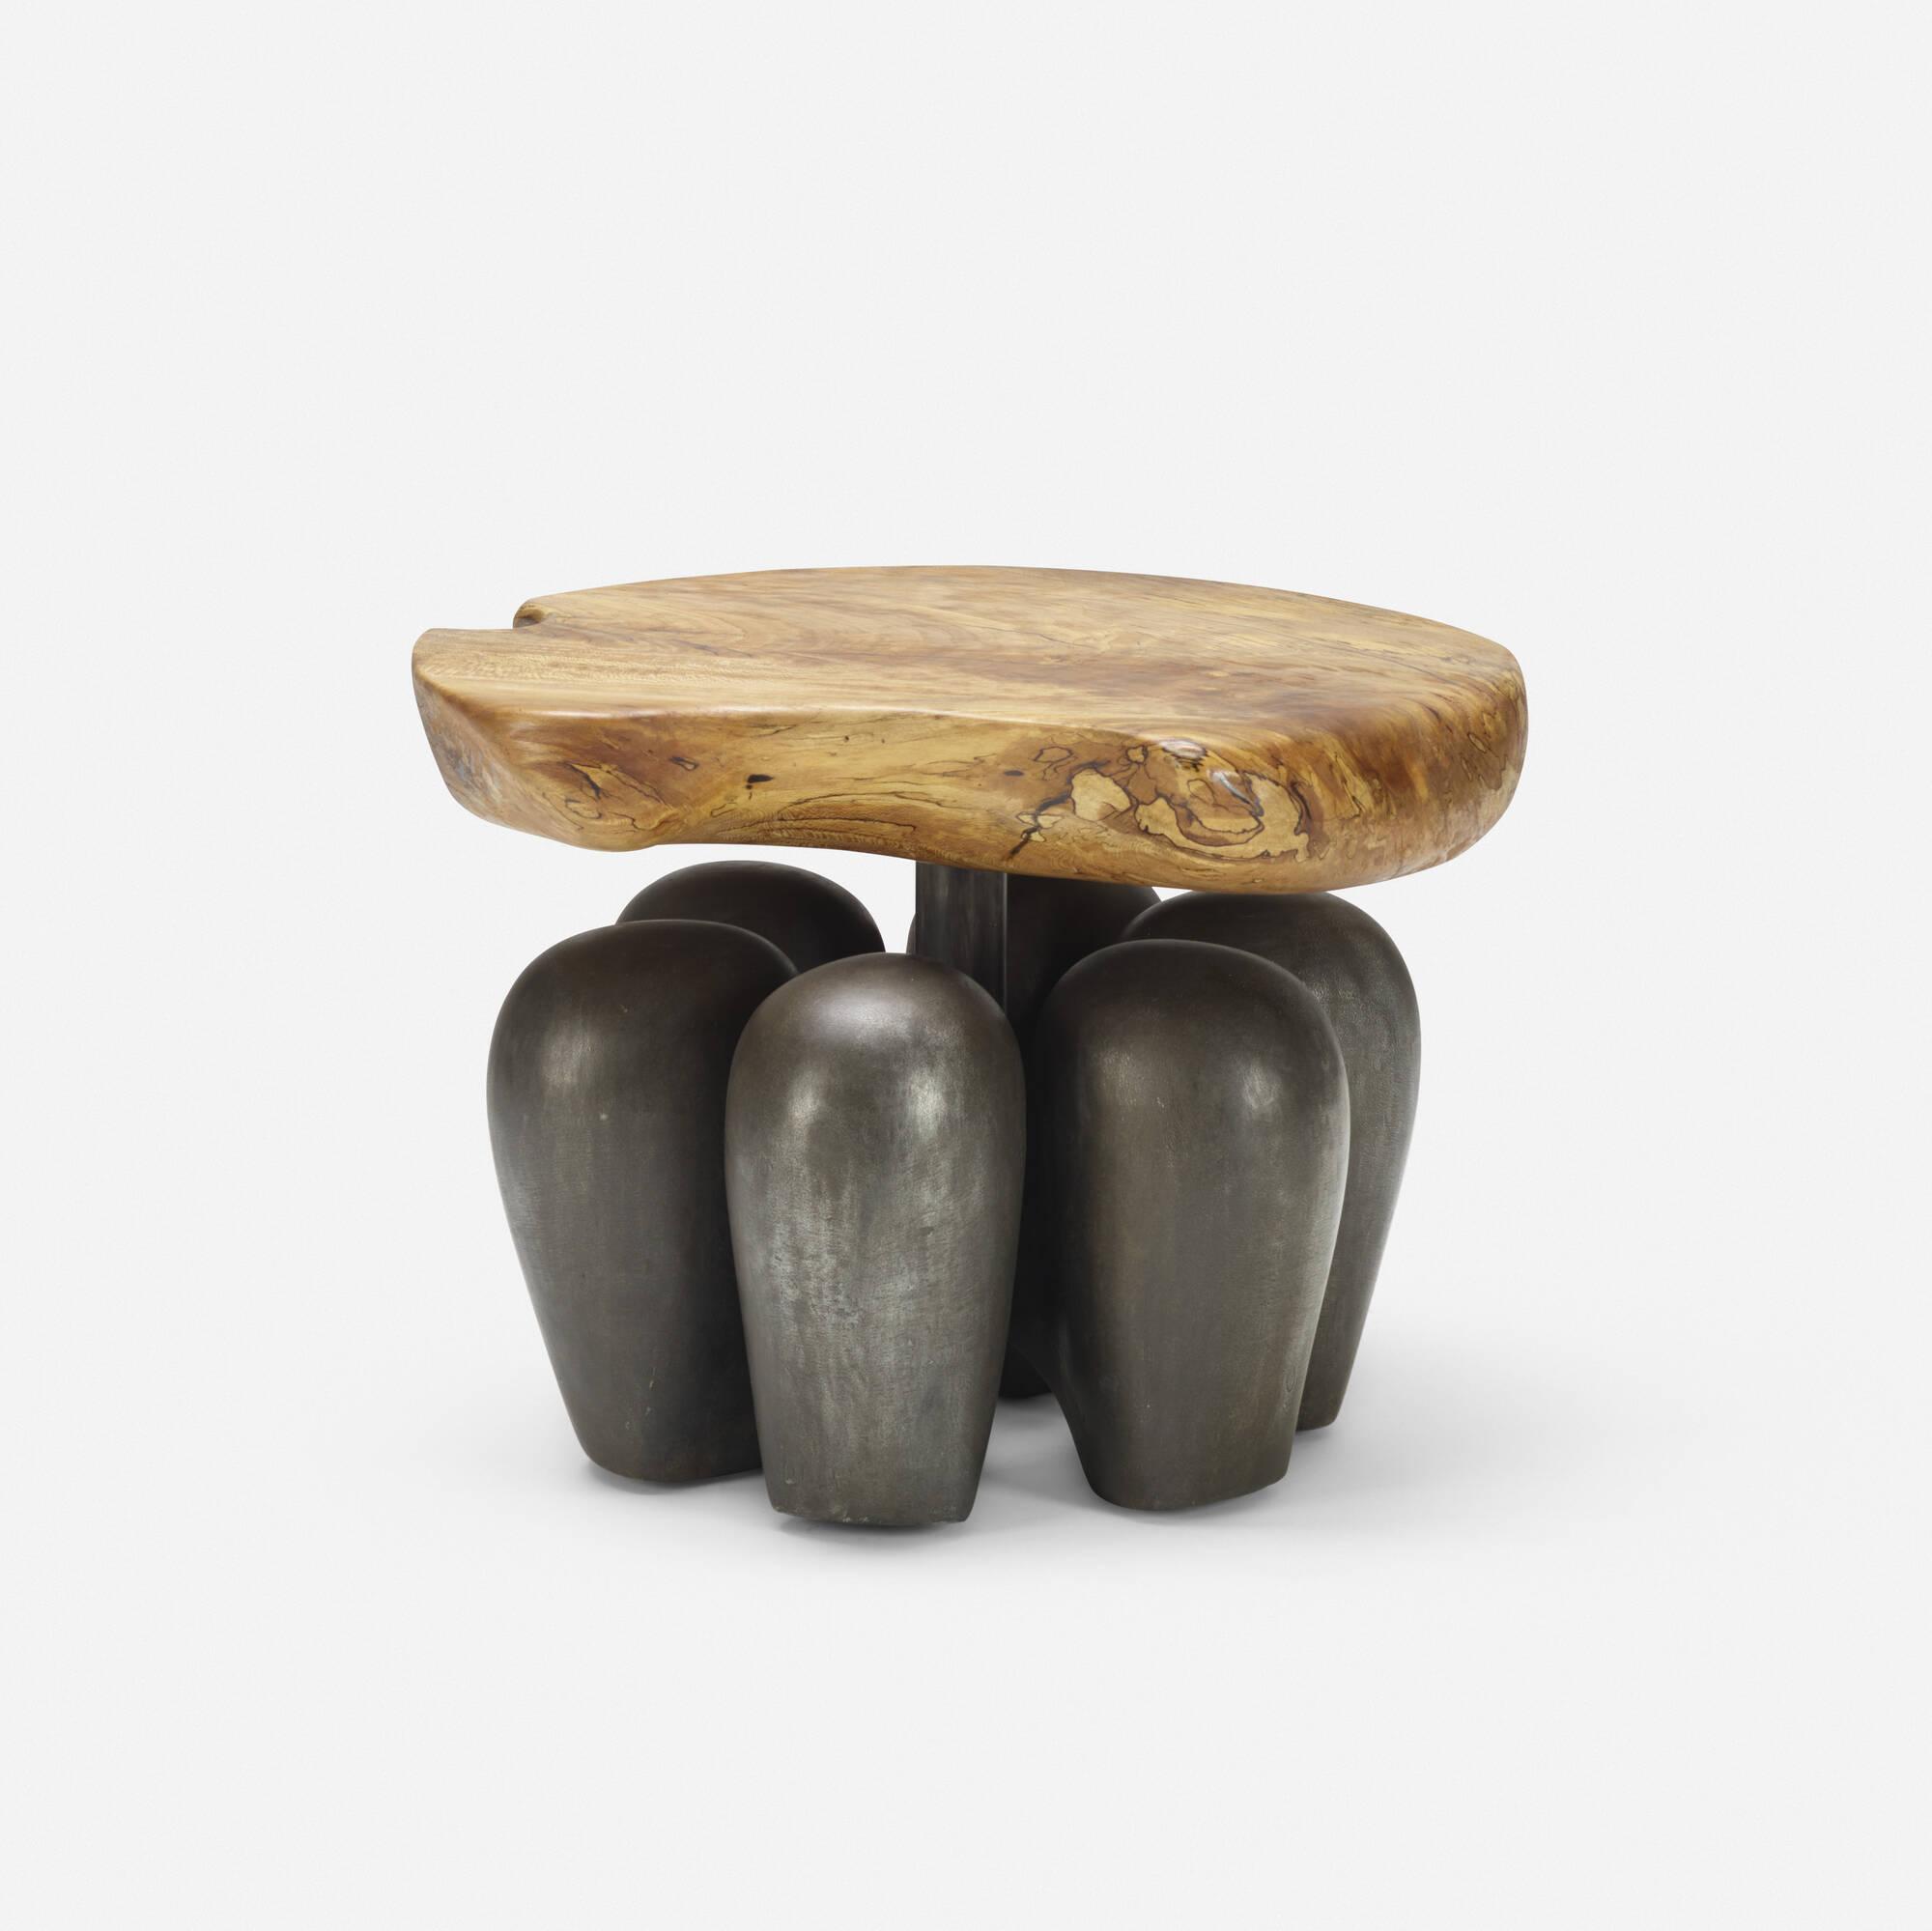 196: Jordan Mozer / prototype Truffala occasional table (1 of 2)